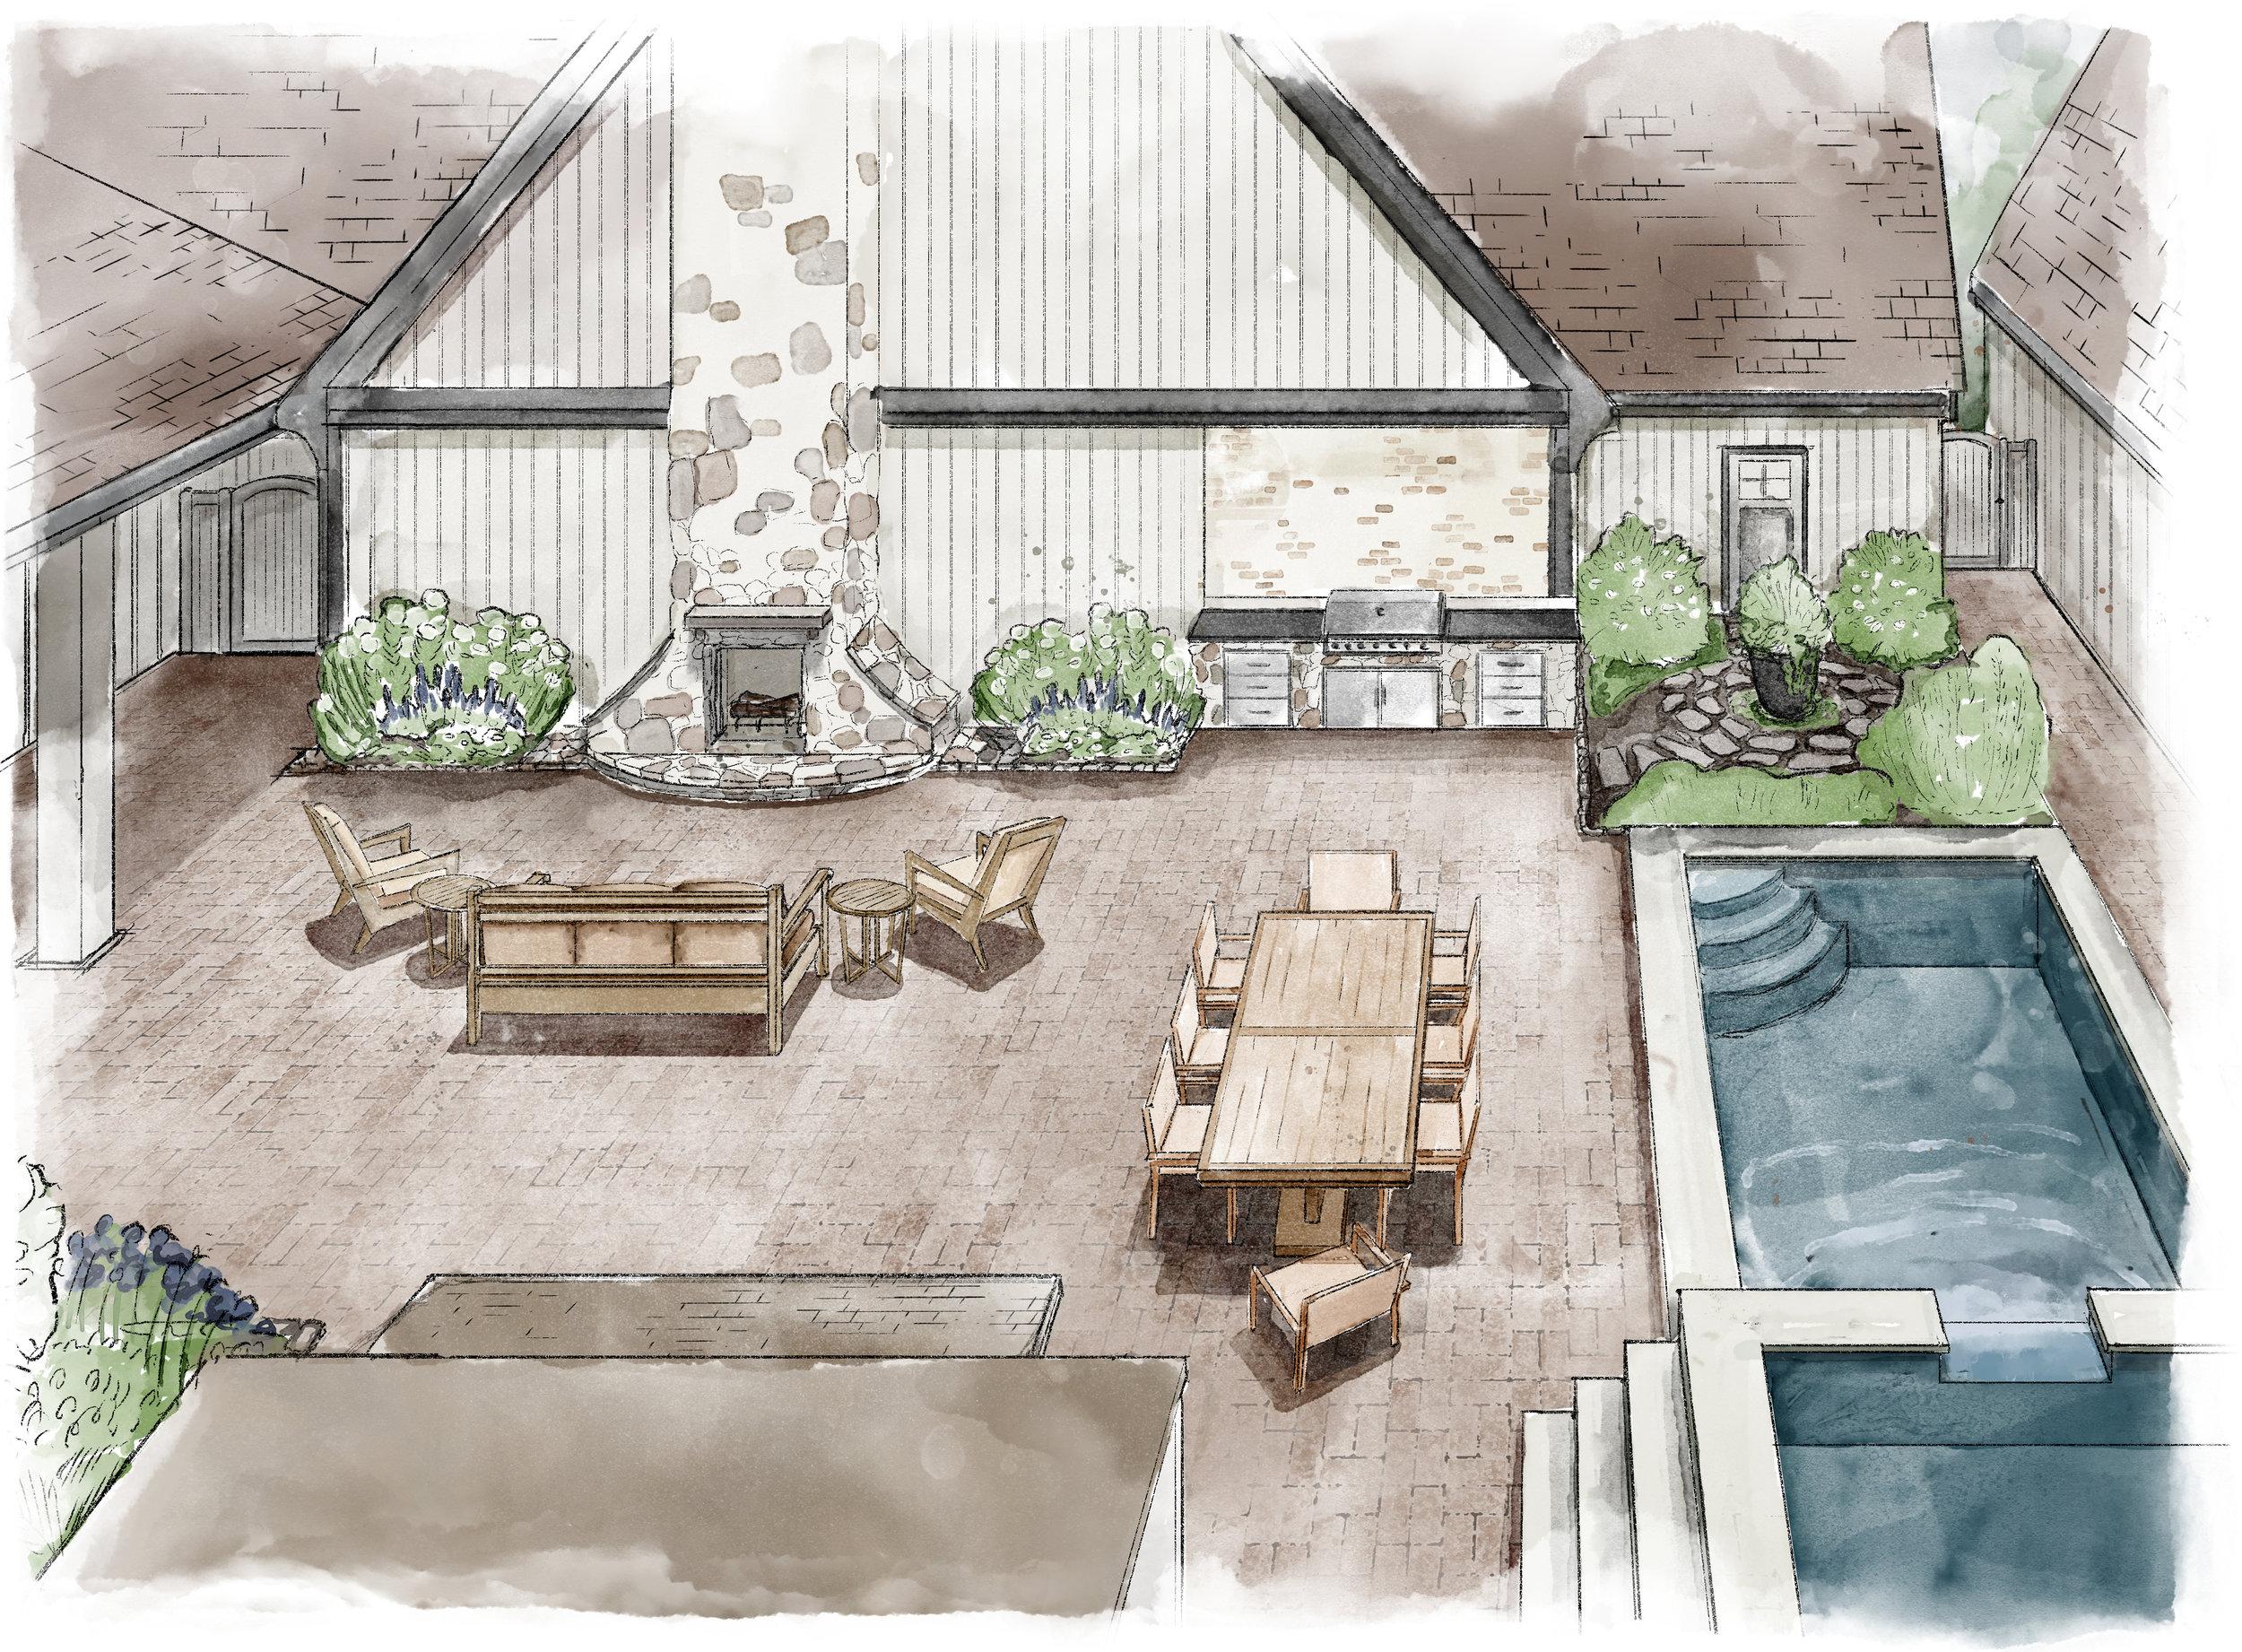 AFH-0002-Illustration_Courtyard_WhiteBG_HighRes.jpg